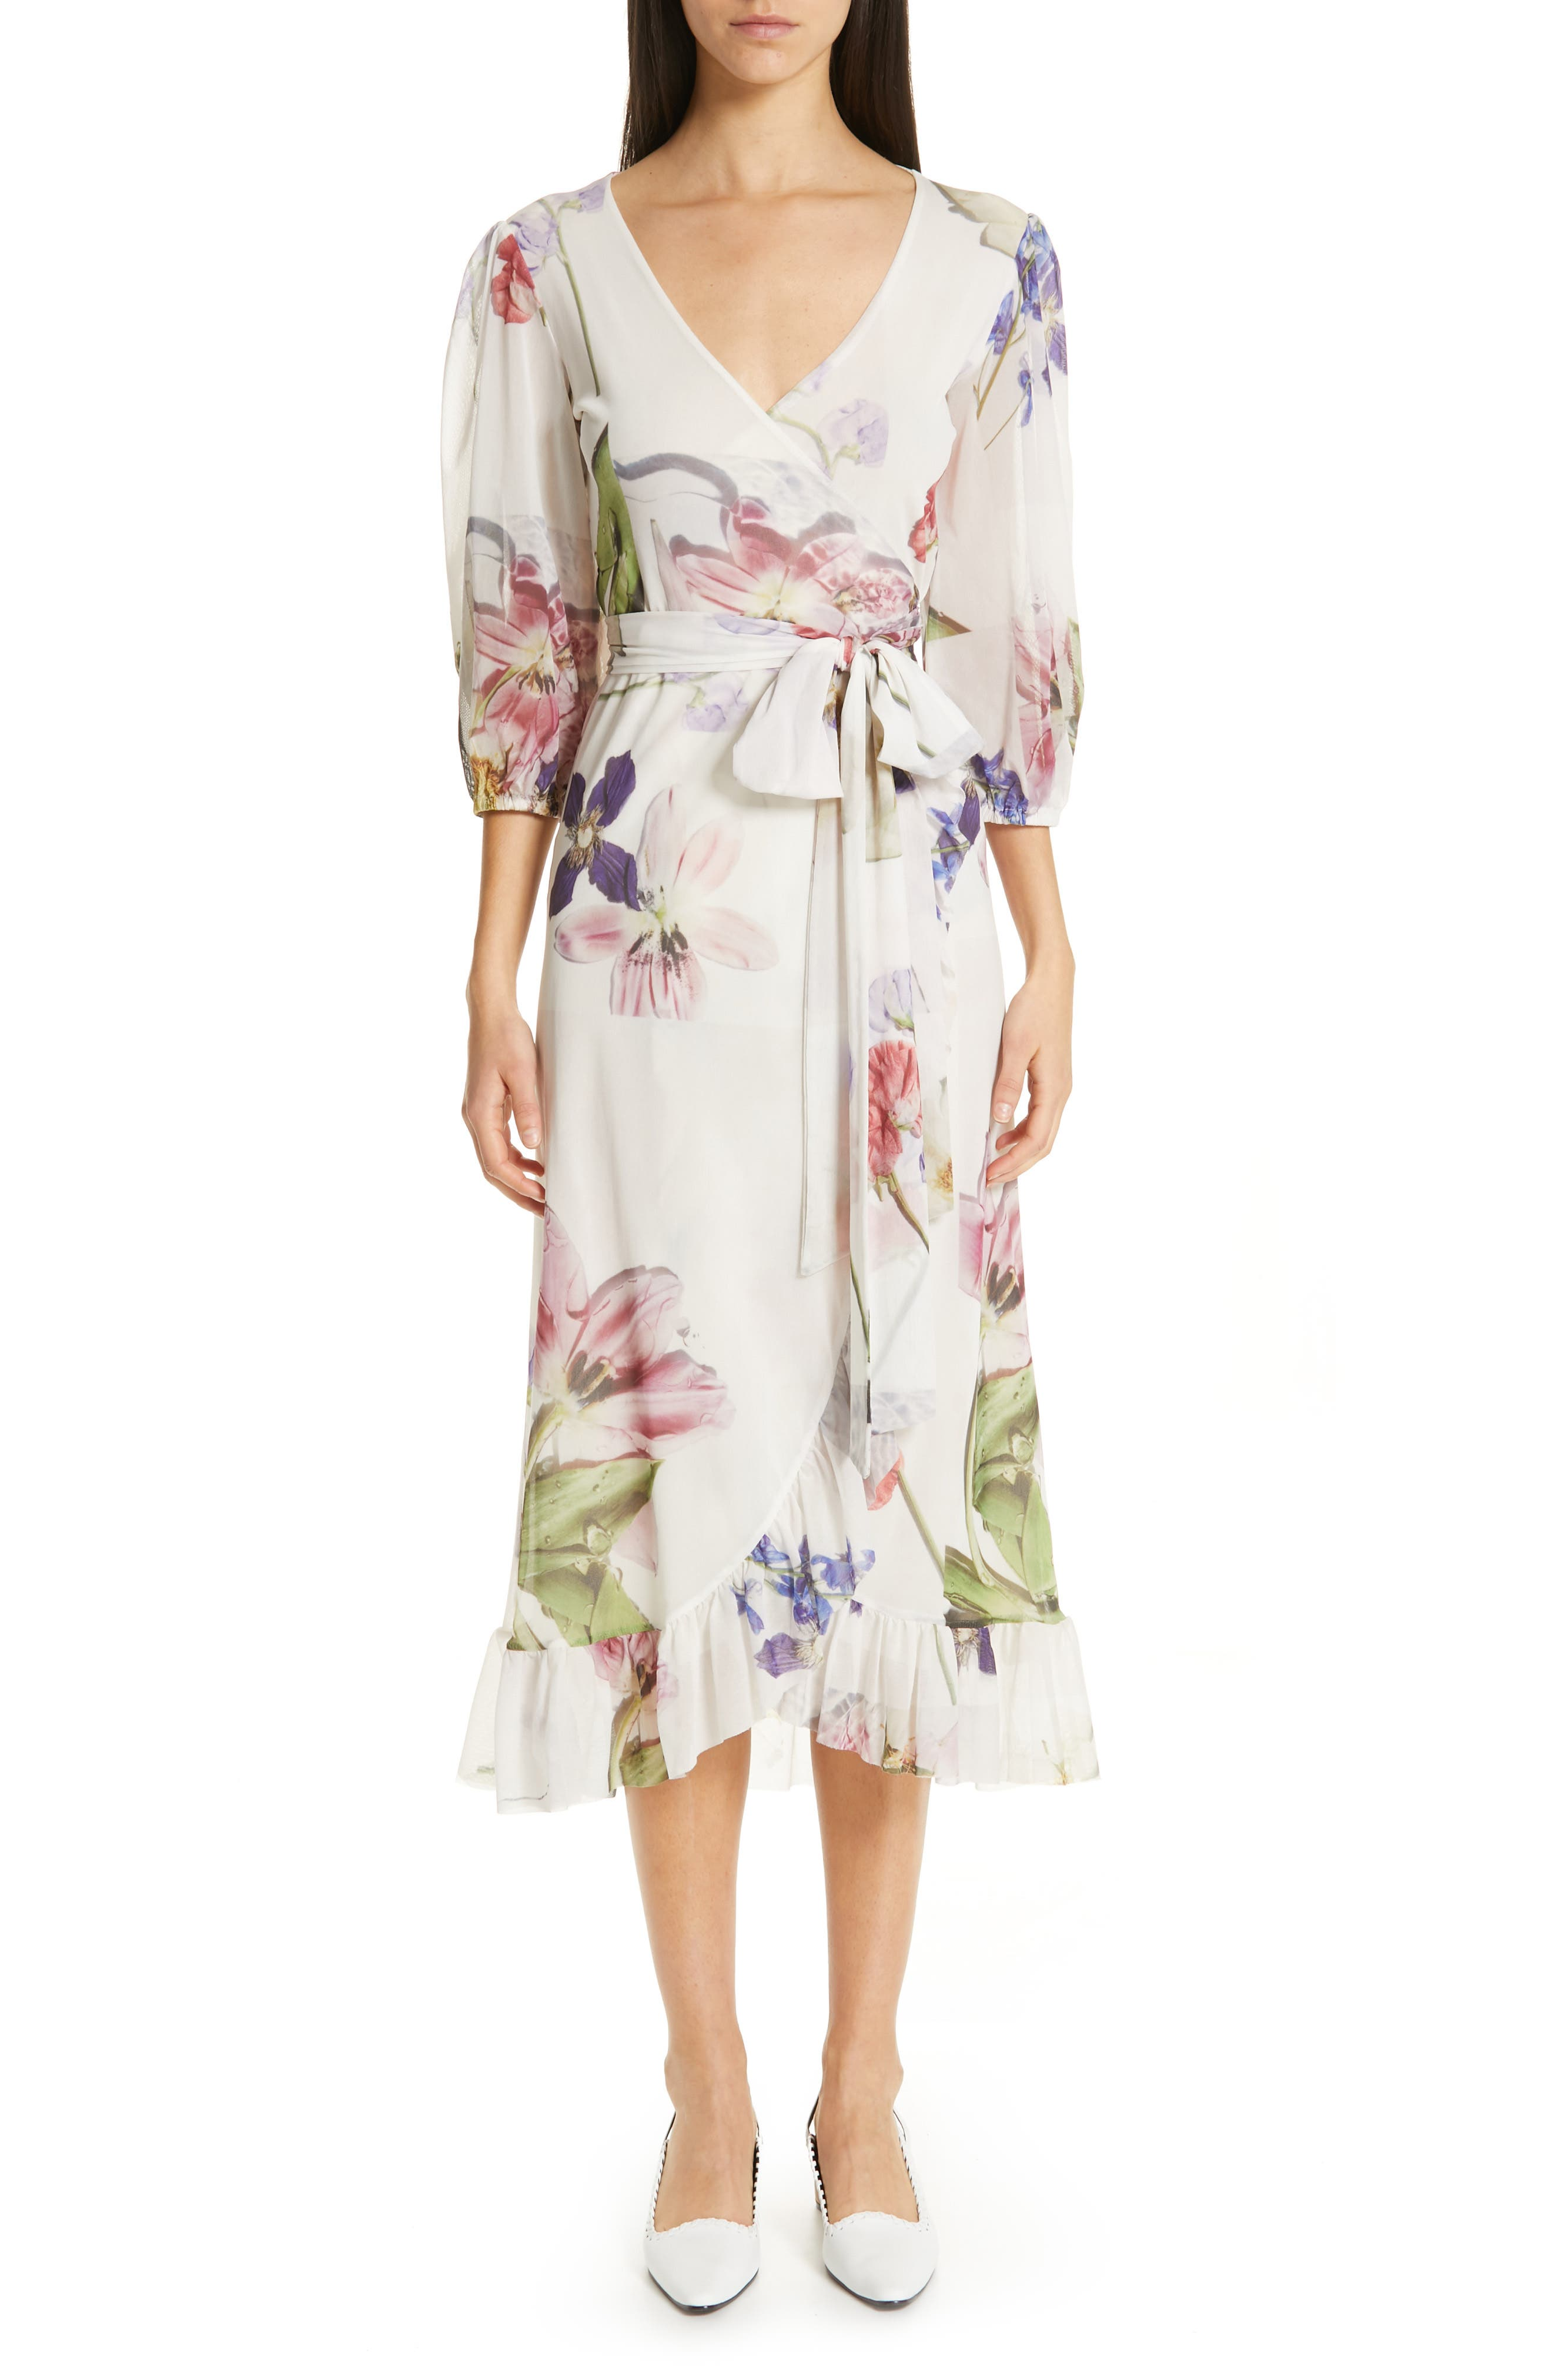 GANNI, Floral Print Mesh Dress, Main thumbnail 1, color, BRIGHT WHITE